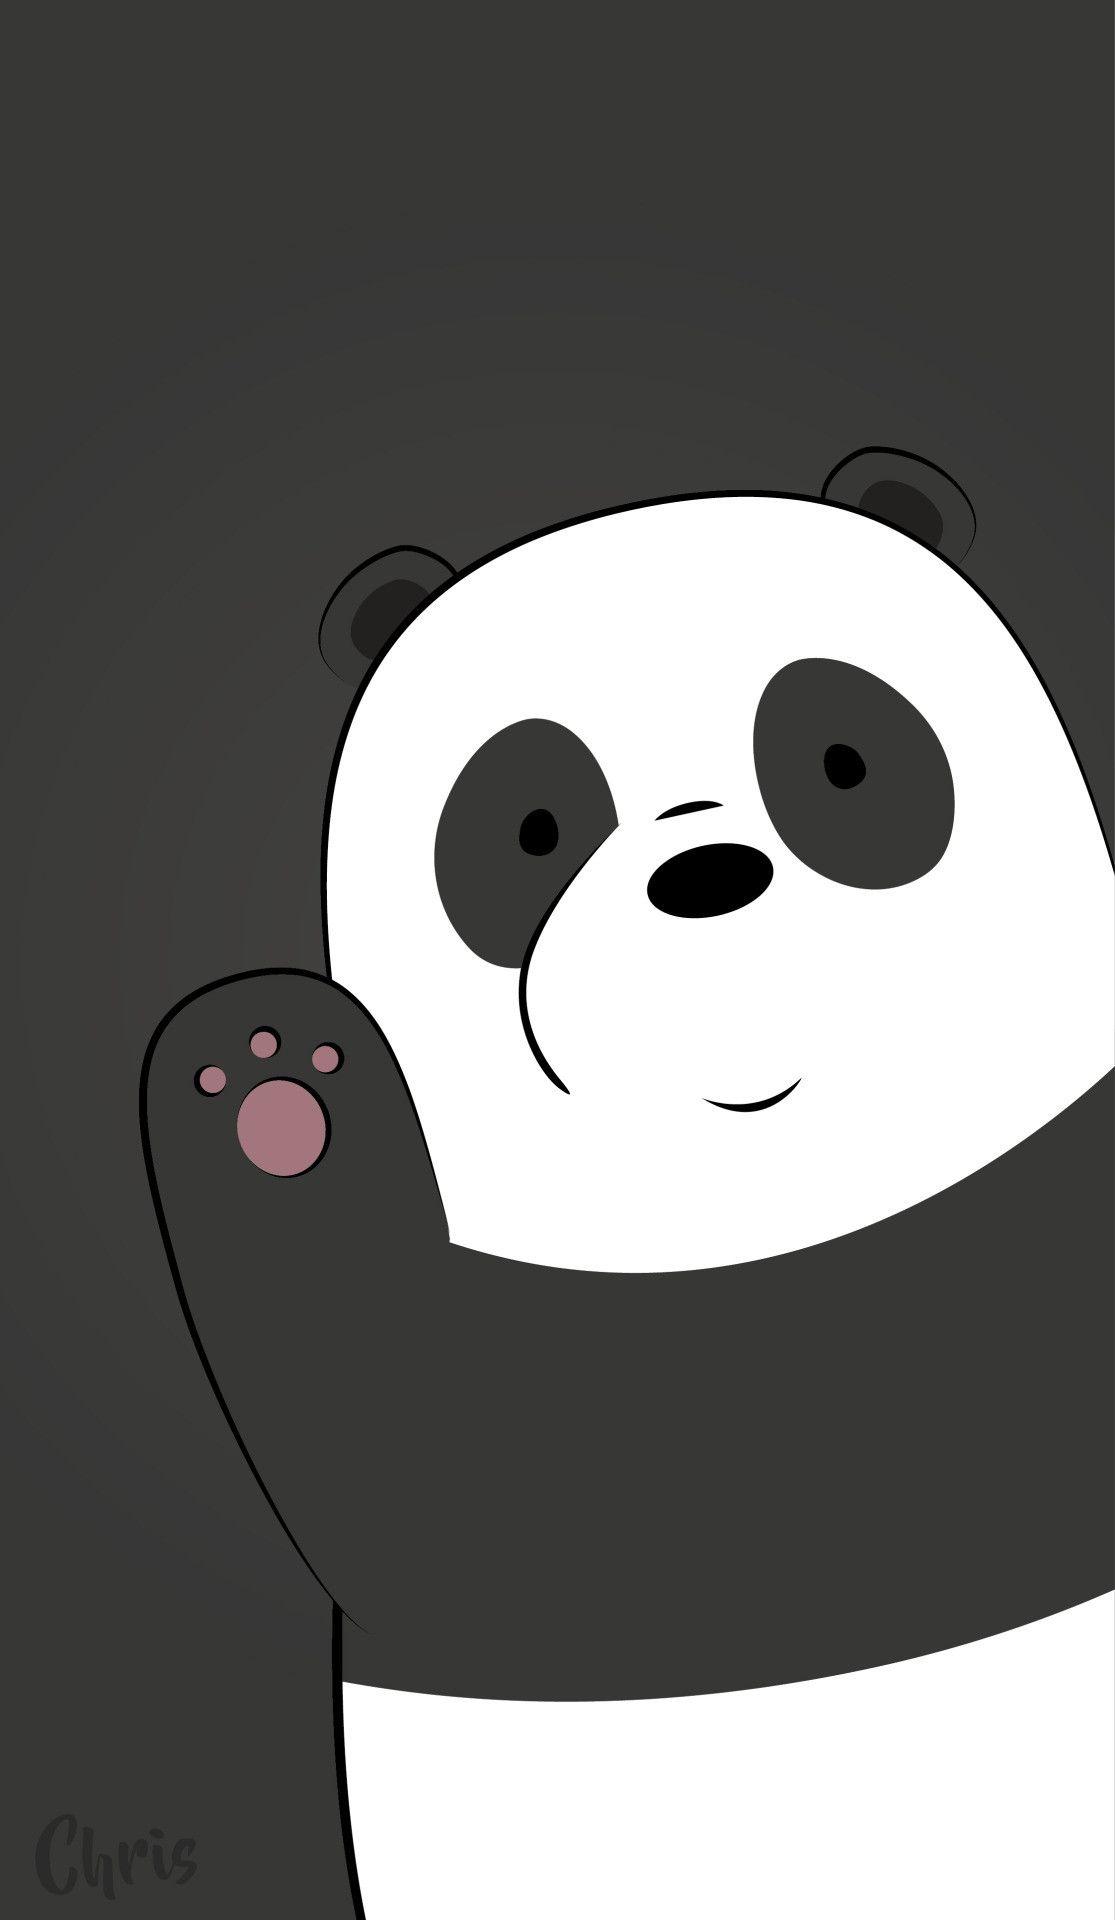 We Bare Bears Wallpaper We Bare Bears Wallpaper 94 Images 1 Wallpaper Anime Wallpaper Emoji Lucu Wallpaper Kartun Hd